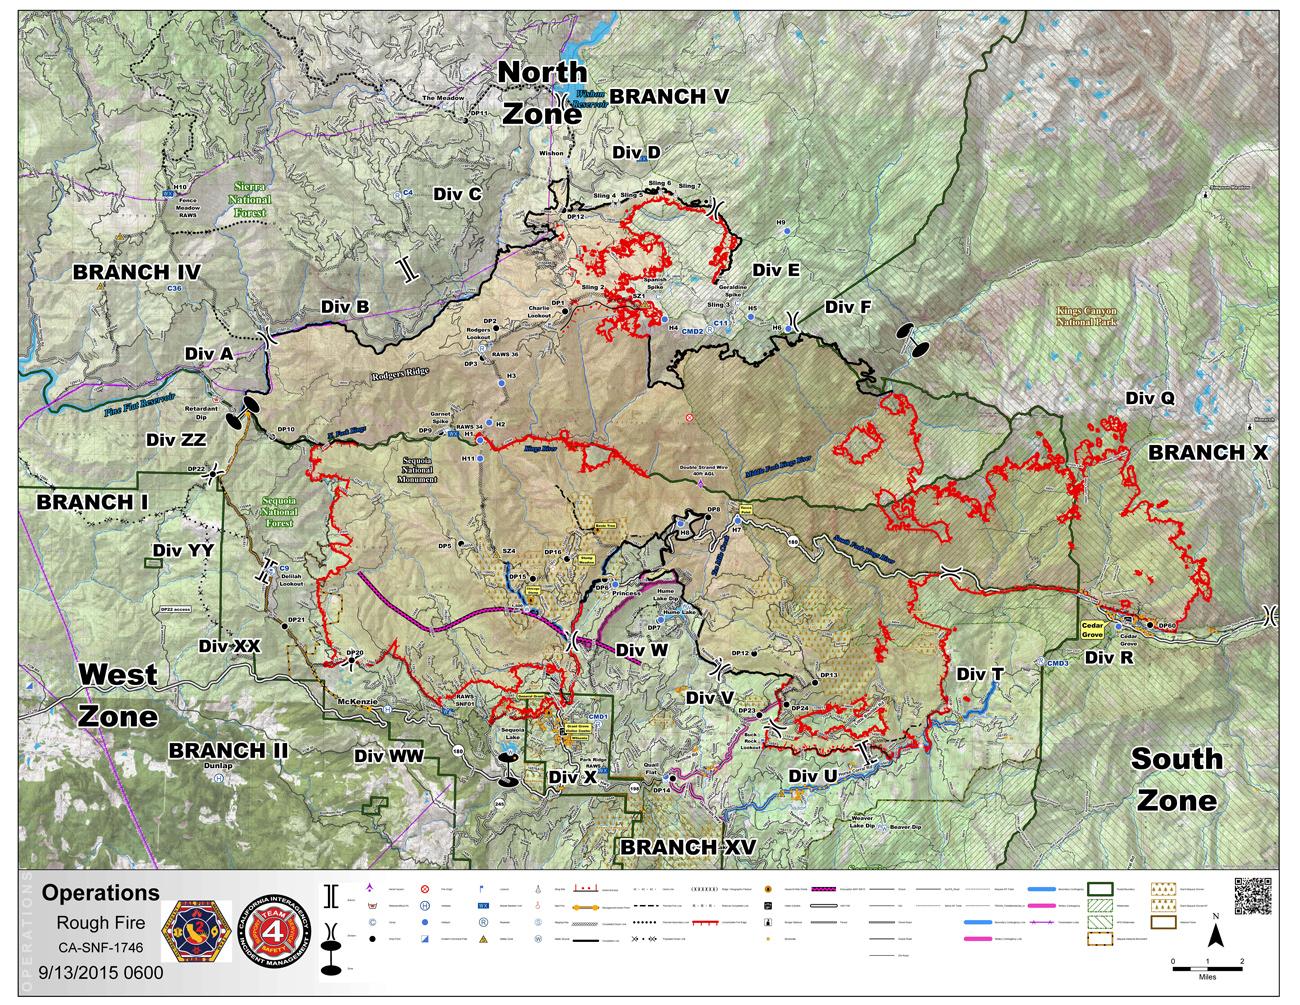 Sierra National Forest Rough Fire Maps for Sunday, September 13, 2015